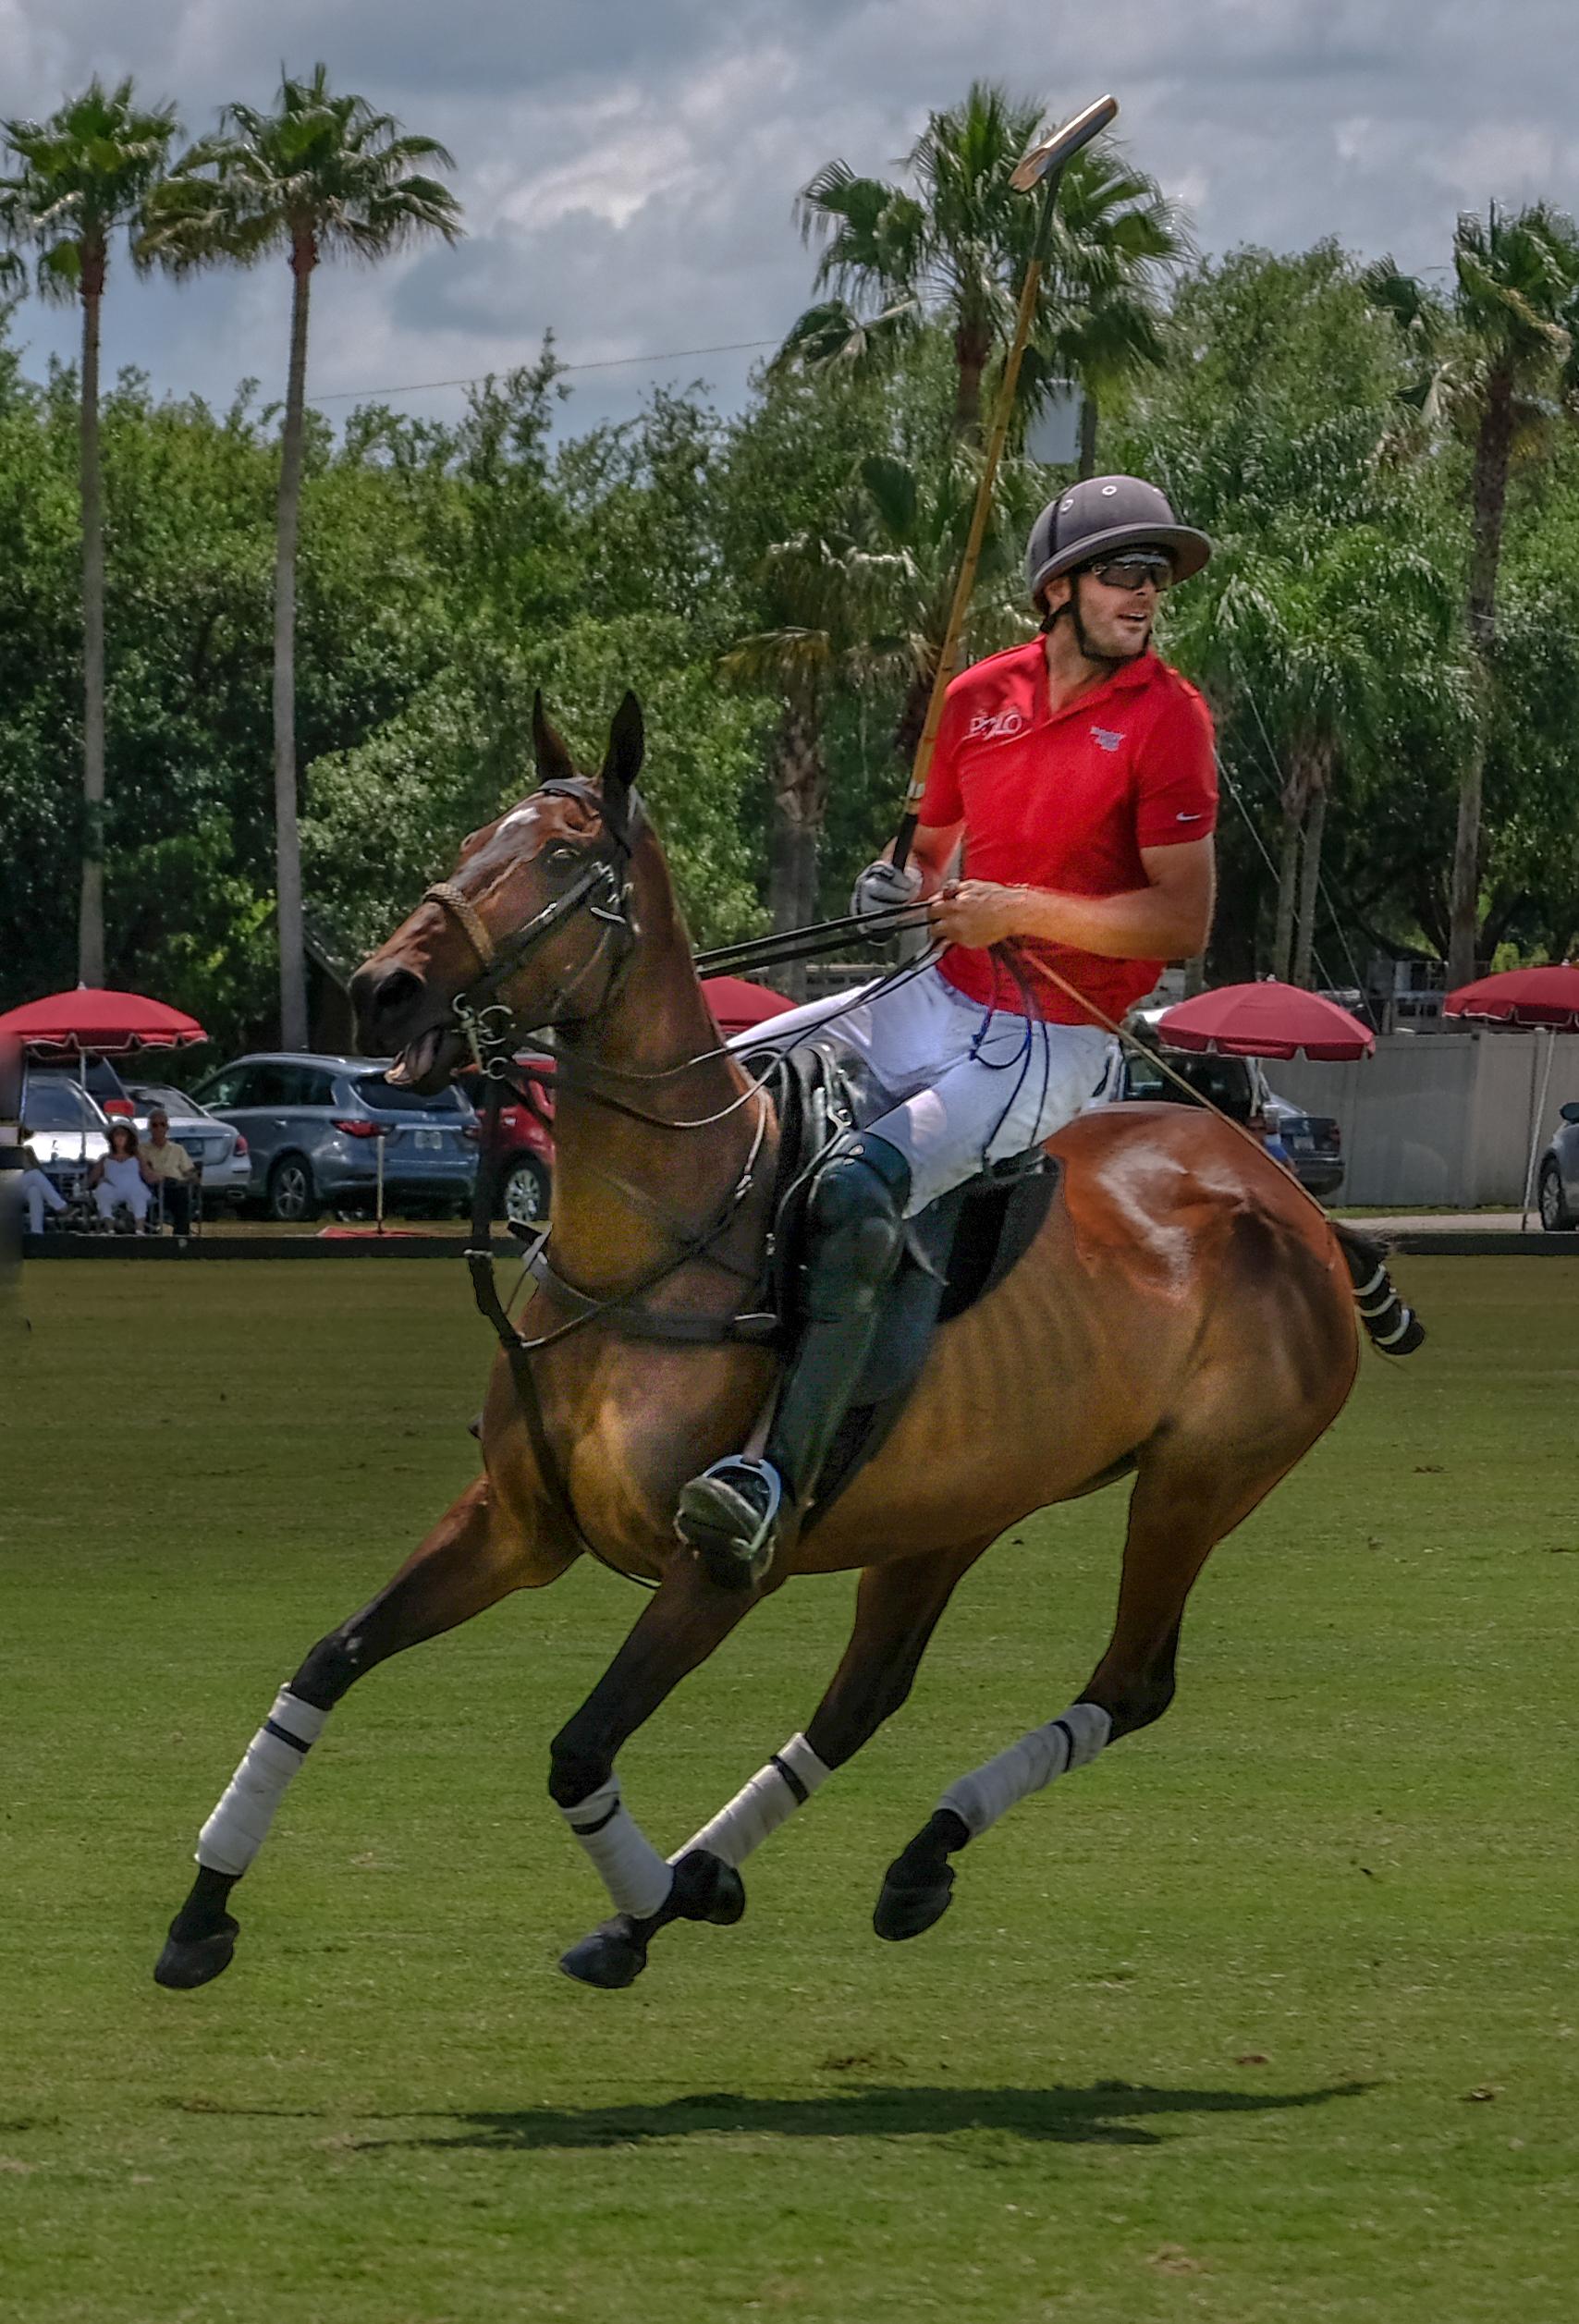 013-Polo-Rider-Wrigley